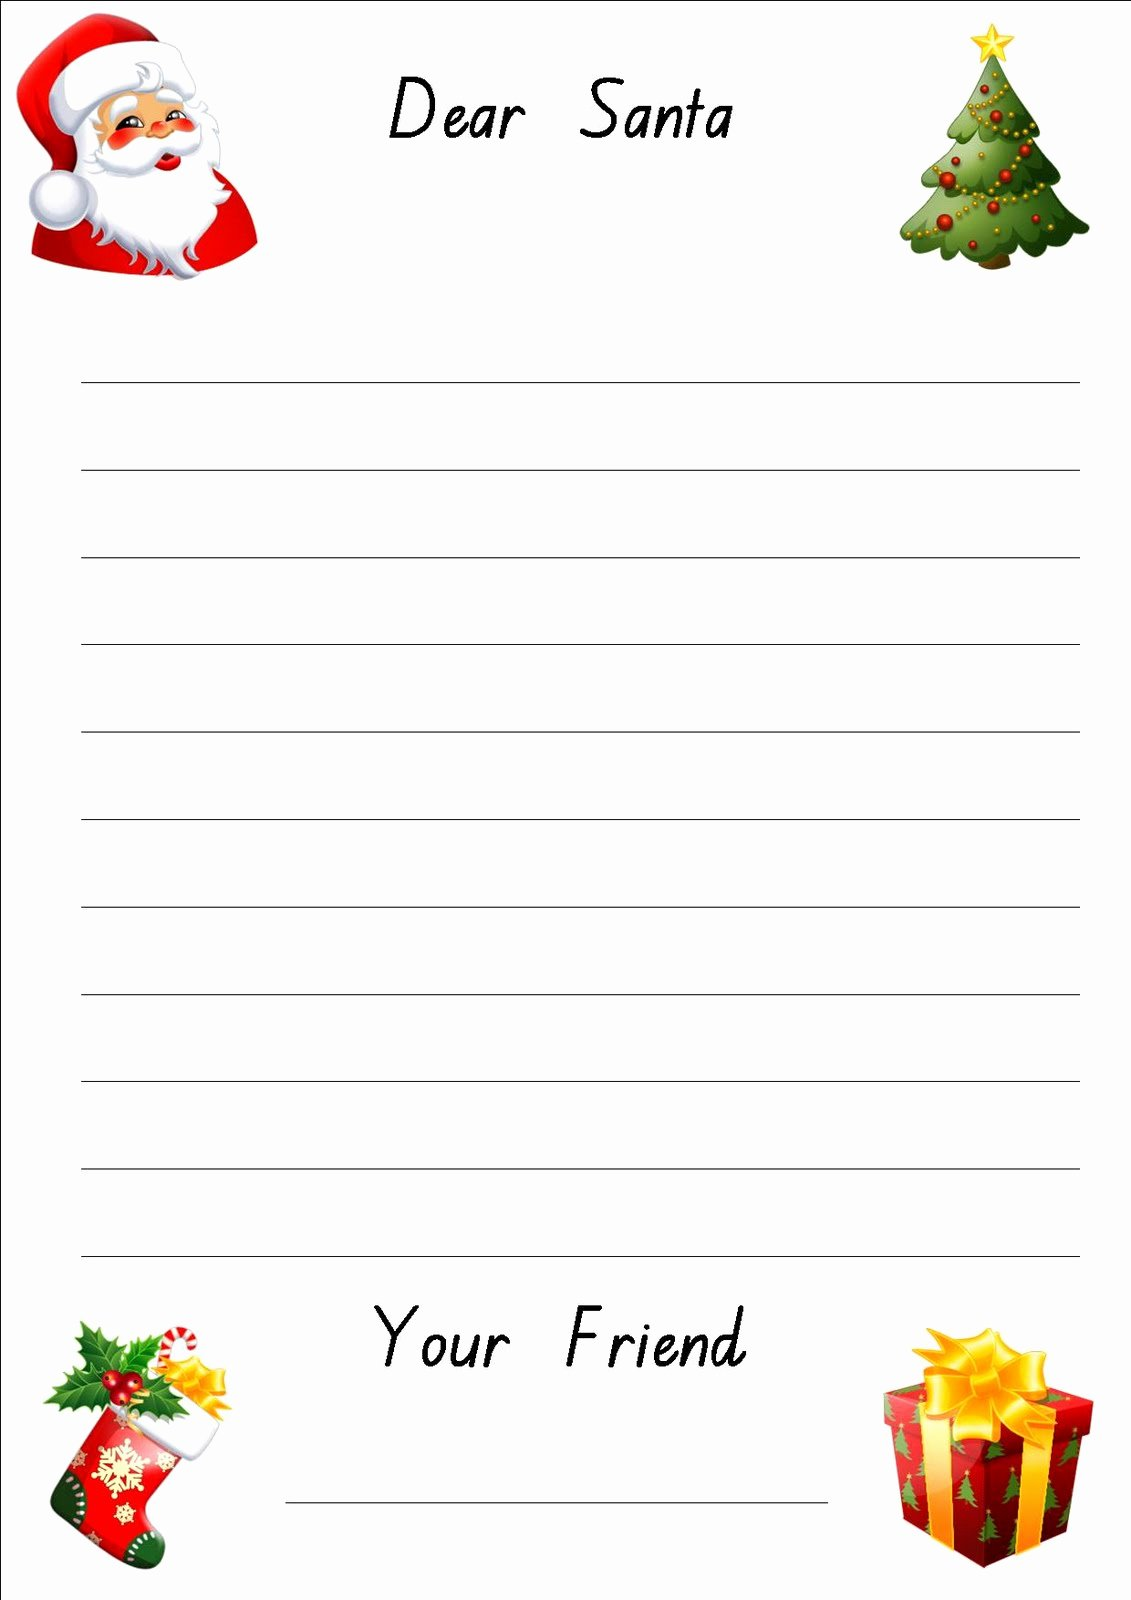 Free Santa Letter Template Elegant Free Printable Letter to Santa Paper